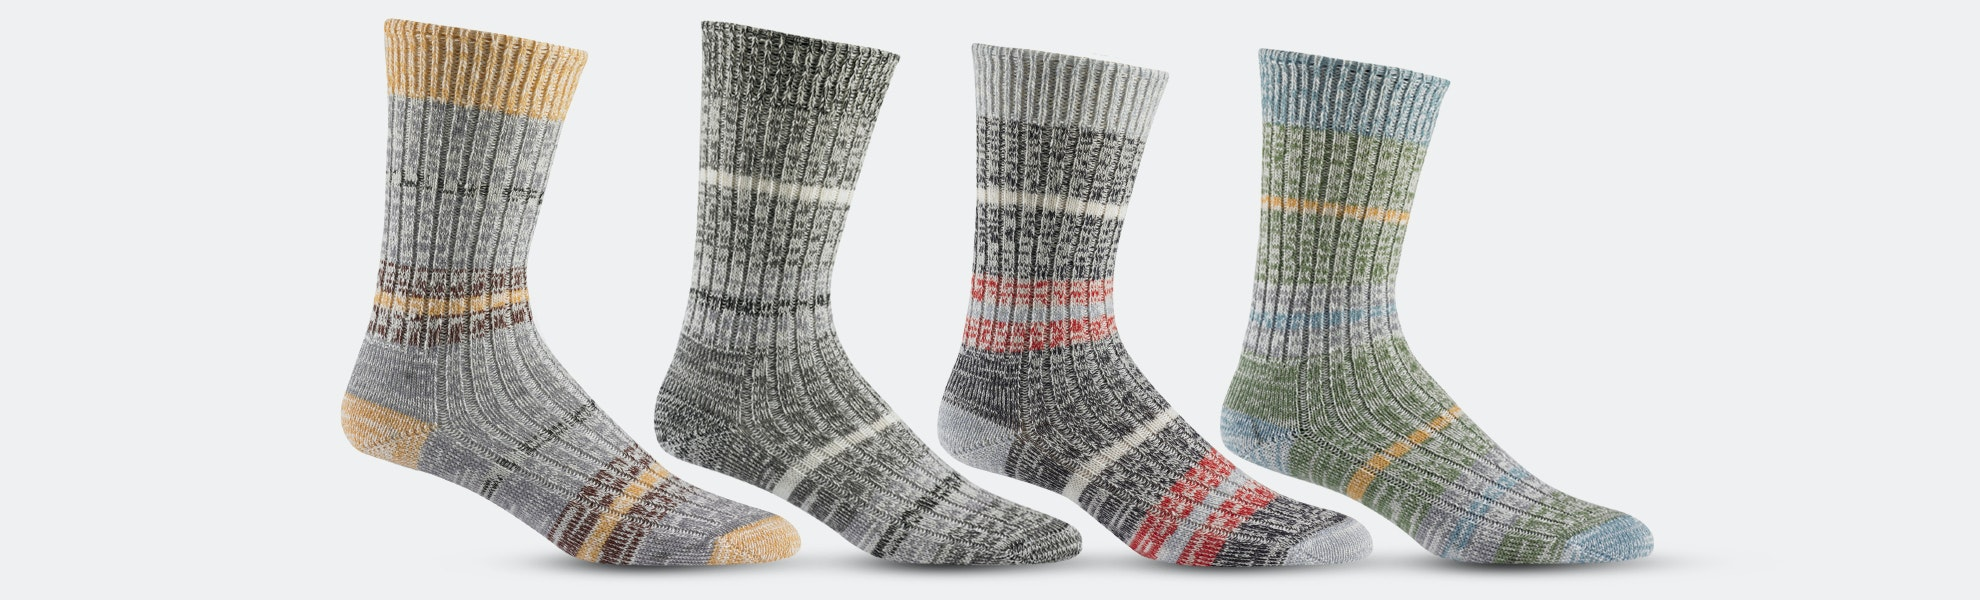 Wigwam Mingle Socks (2-Pack)